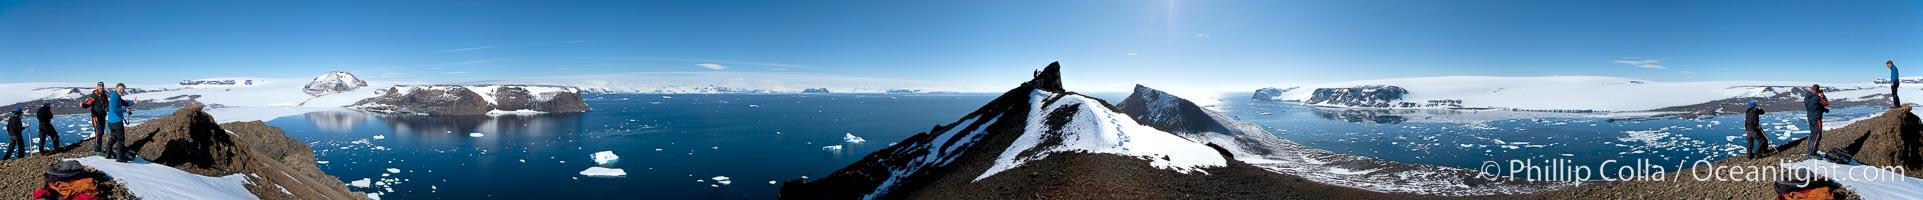 Panorama of Devil Island in Antarctica. Devil Island, Antarctic Peninsula, Antarctica, natural history stock photograph, photo id 26302